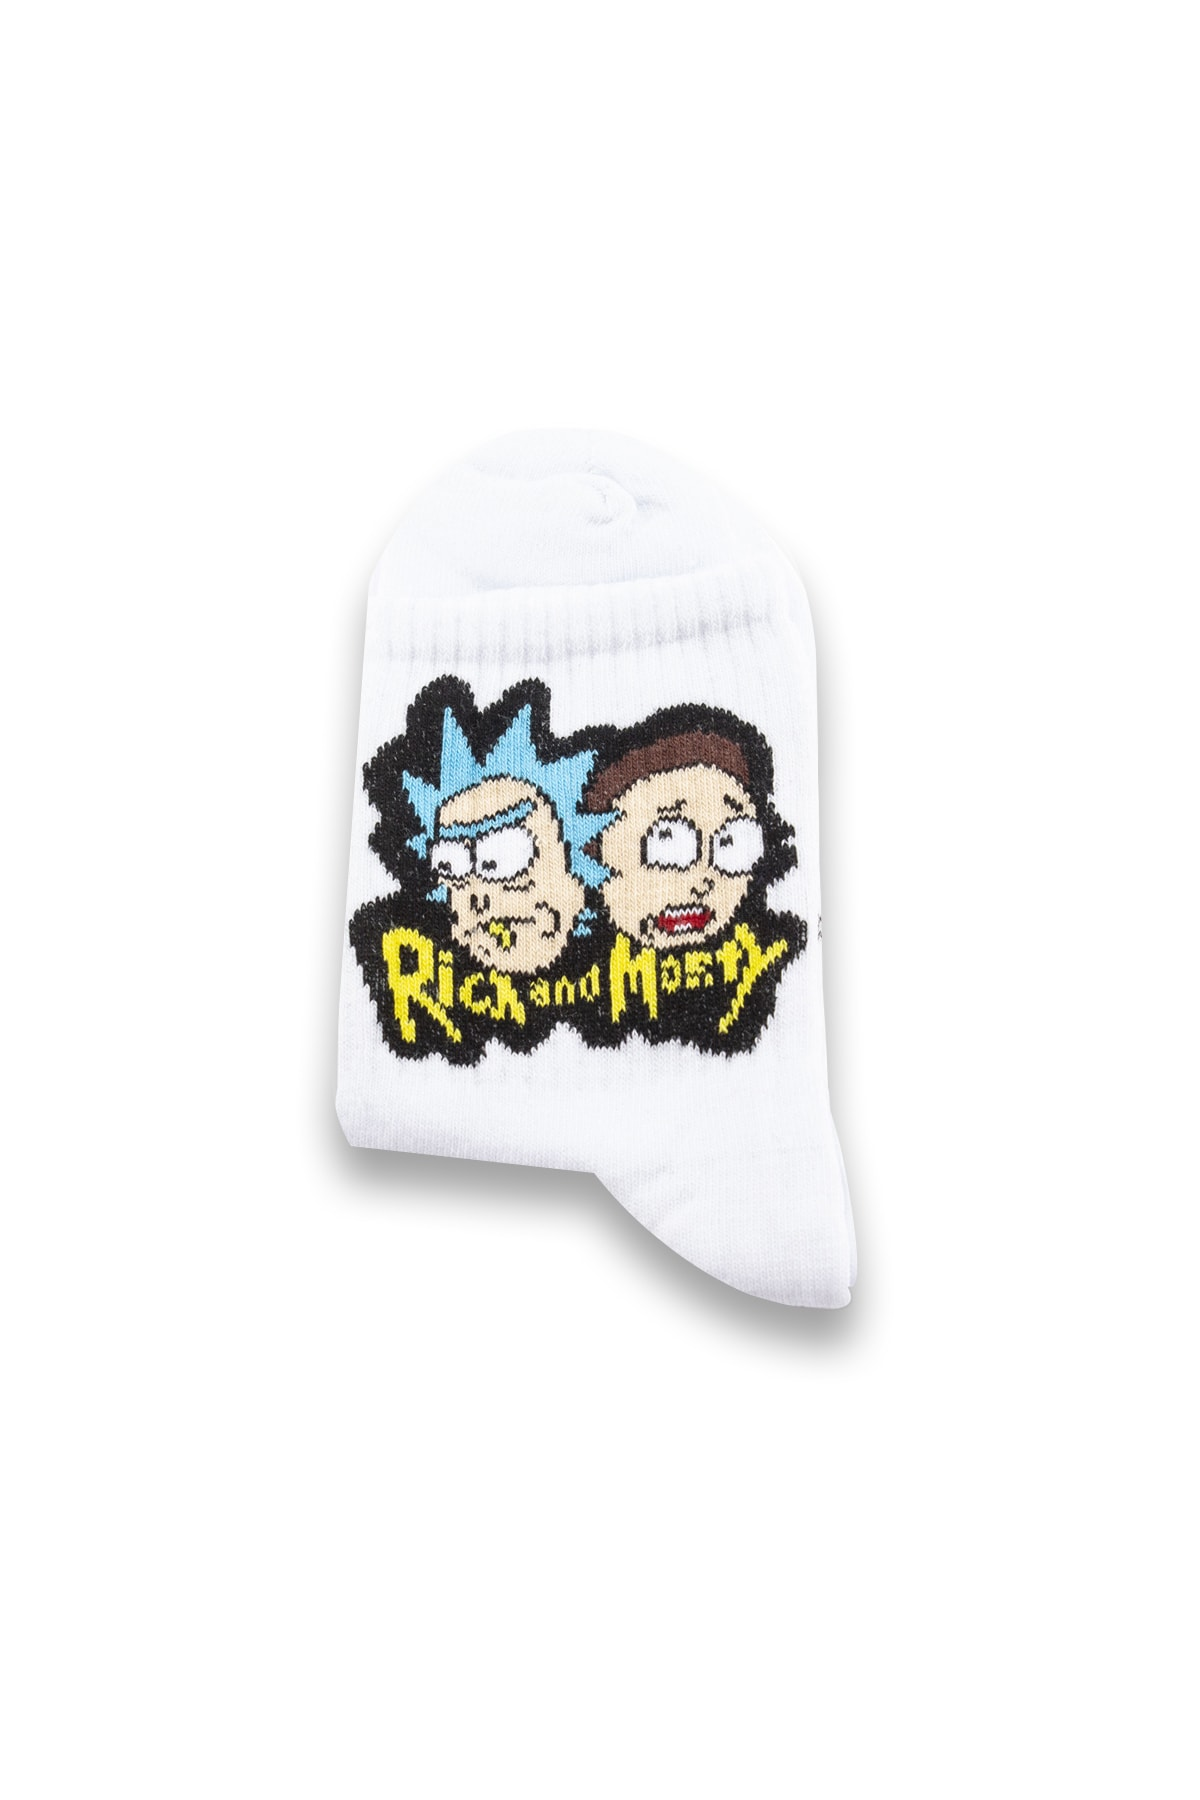 Socksarmy Rick & Morty Desenli 5 'li Renkli Çorap Seti 2